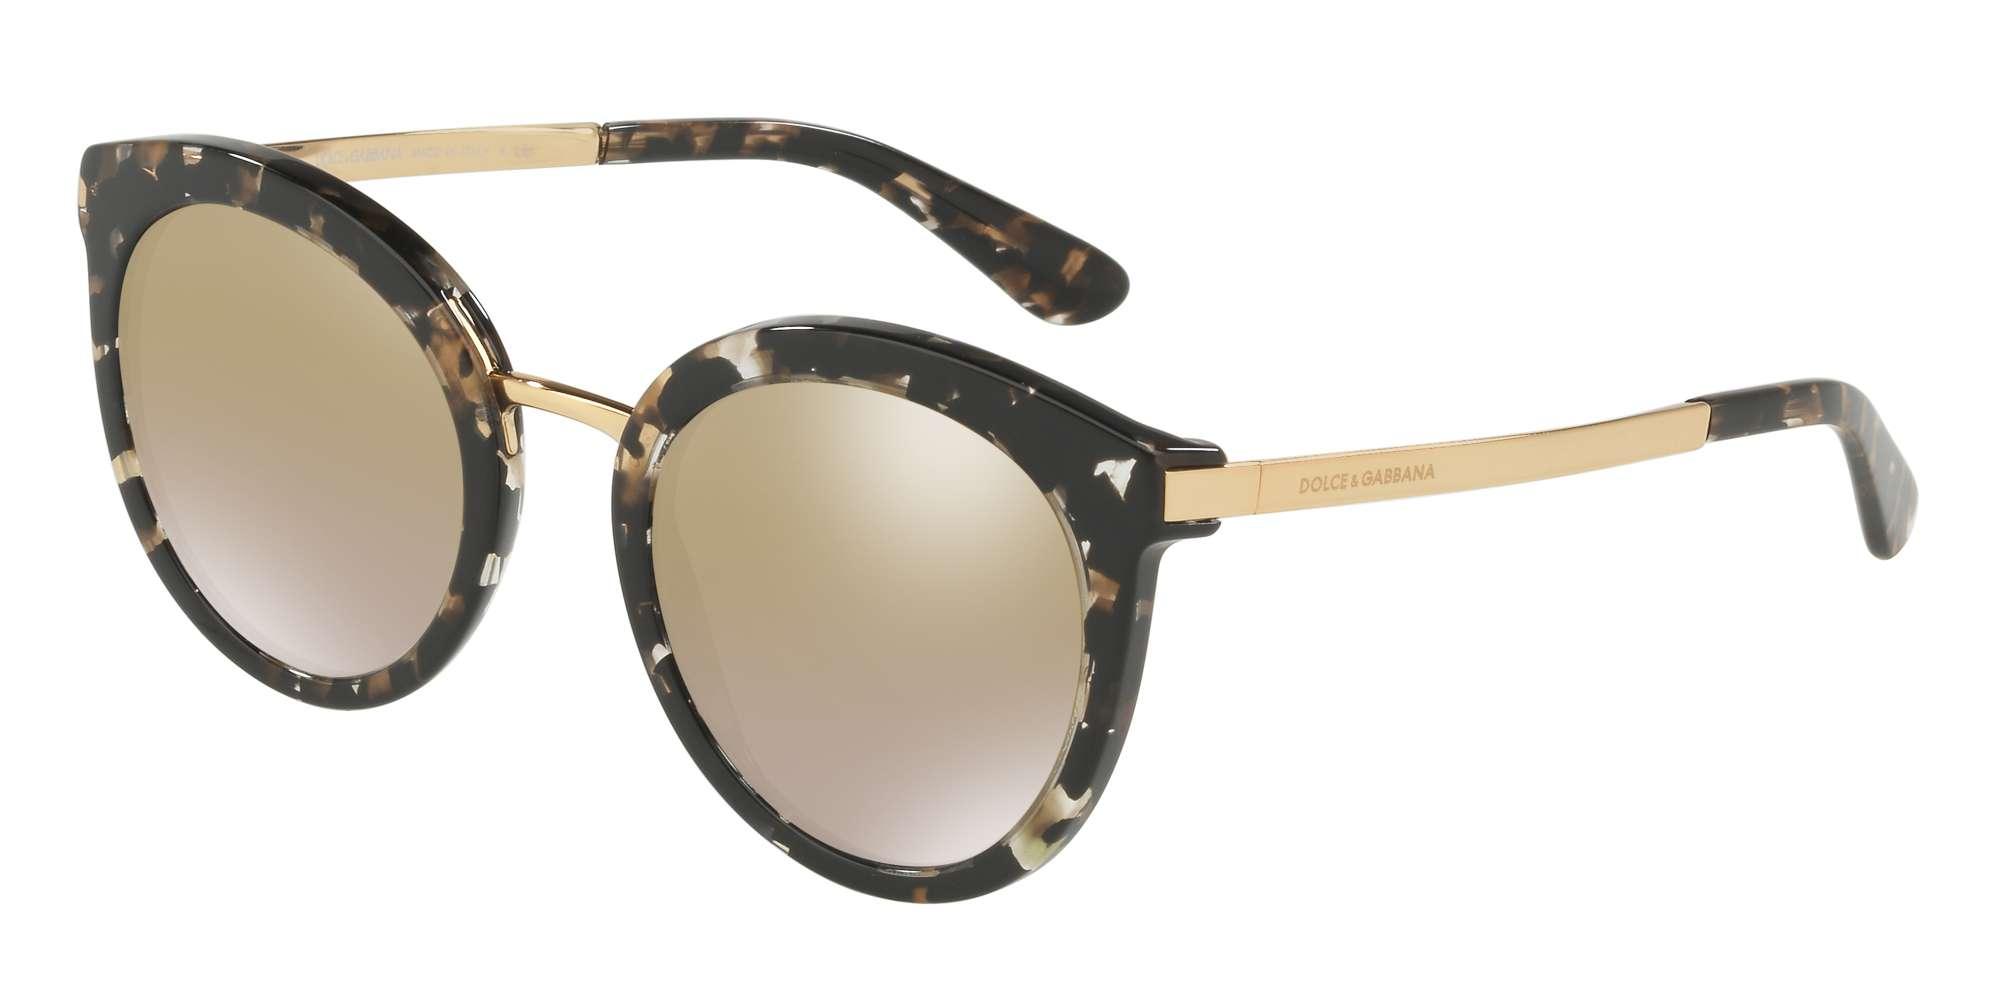 CUBE BLACK/GOLD / GRAD LIGHT BROWN MIRROR GOLD lenses